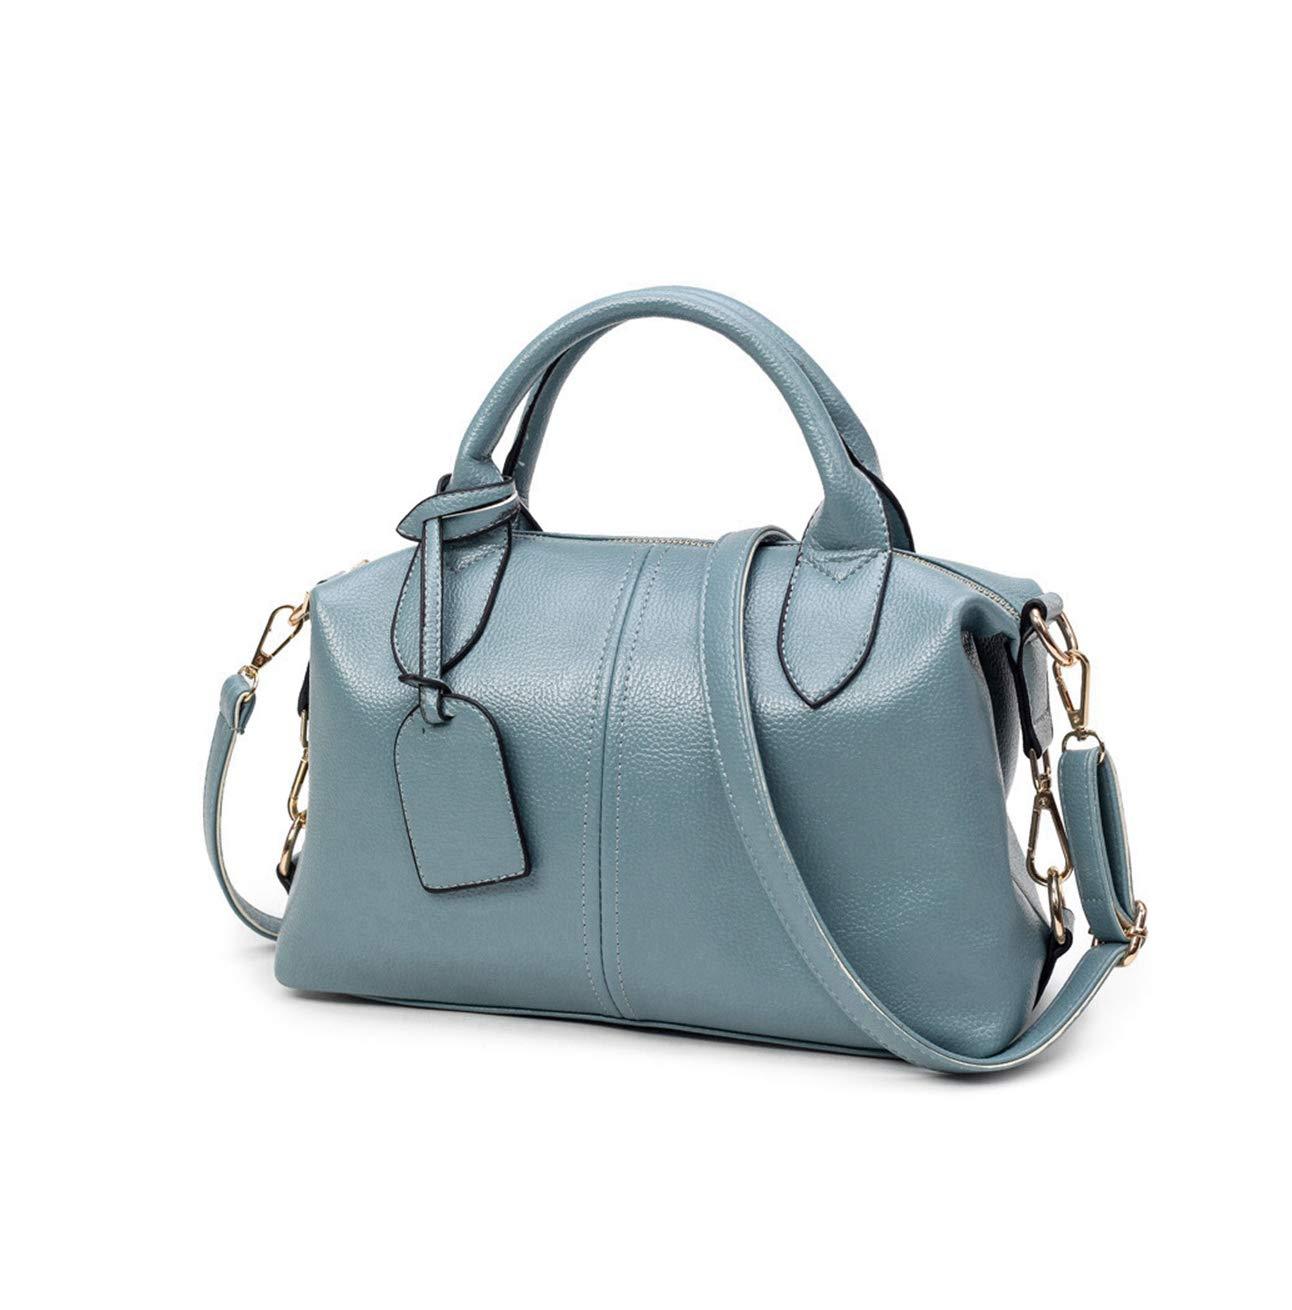 Sunwel Fashion Women's Faux Leather Medium Boston Bags Shoulder Strap Crossbody Handbag Tote Laptop Satchel Purse (Style B: Blue) by Sunwel Fashion